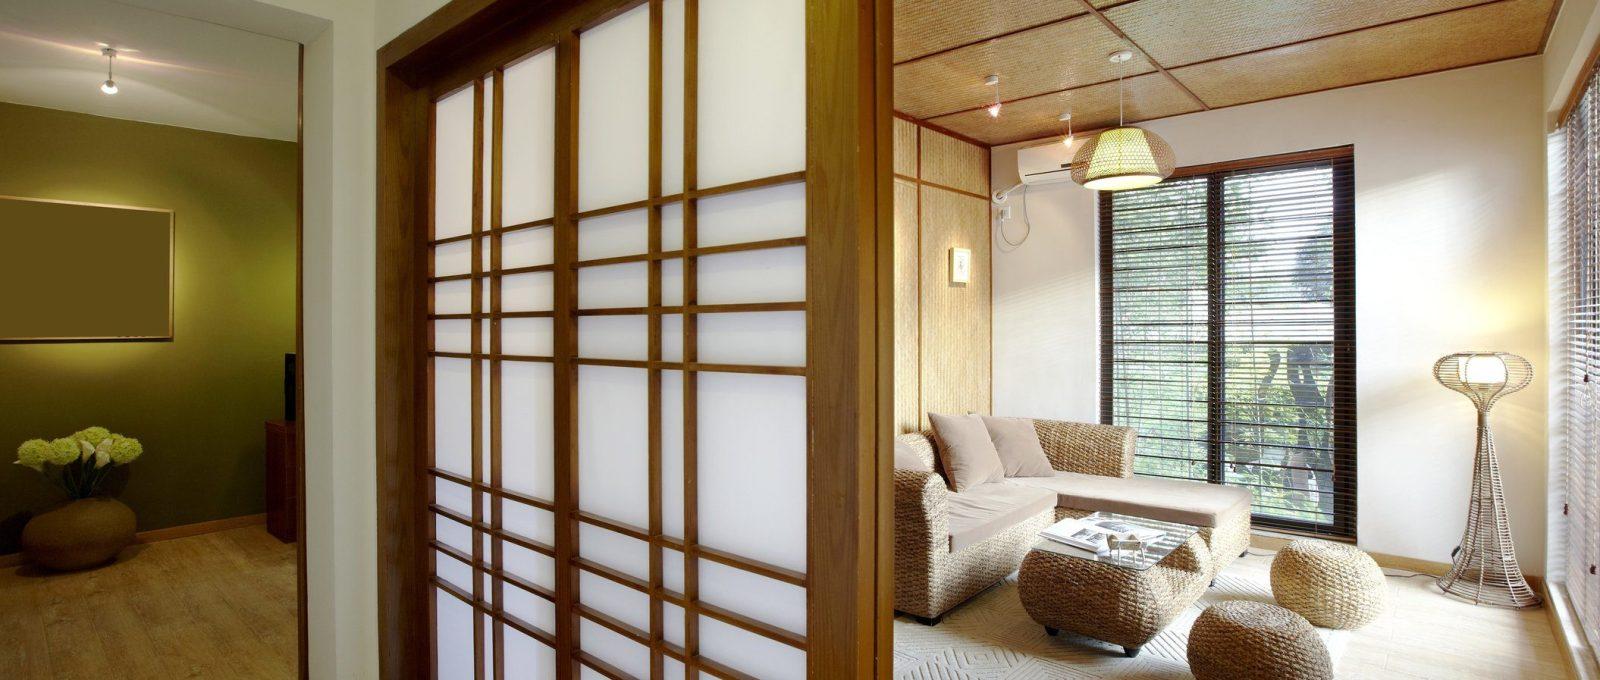 japanese apartment renting